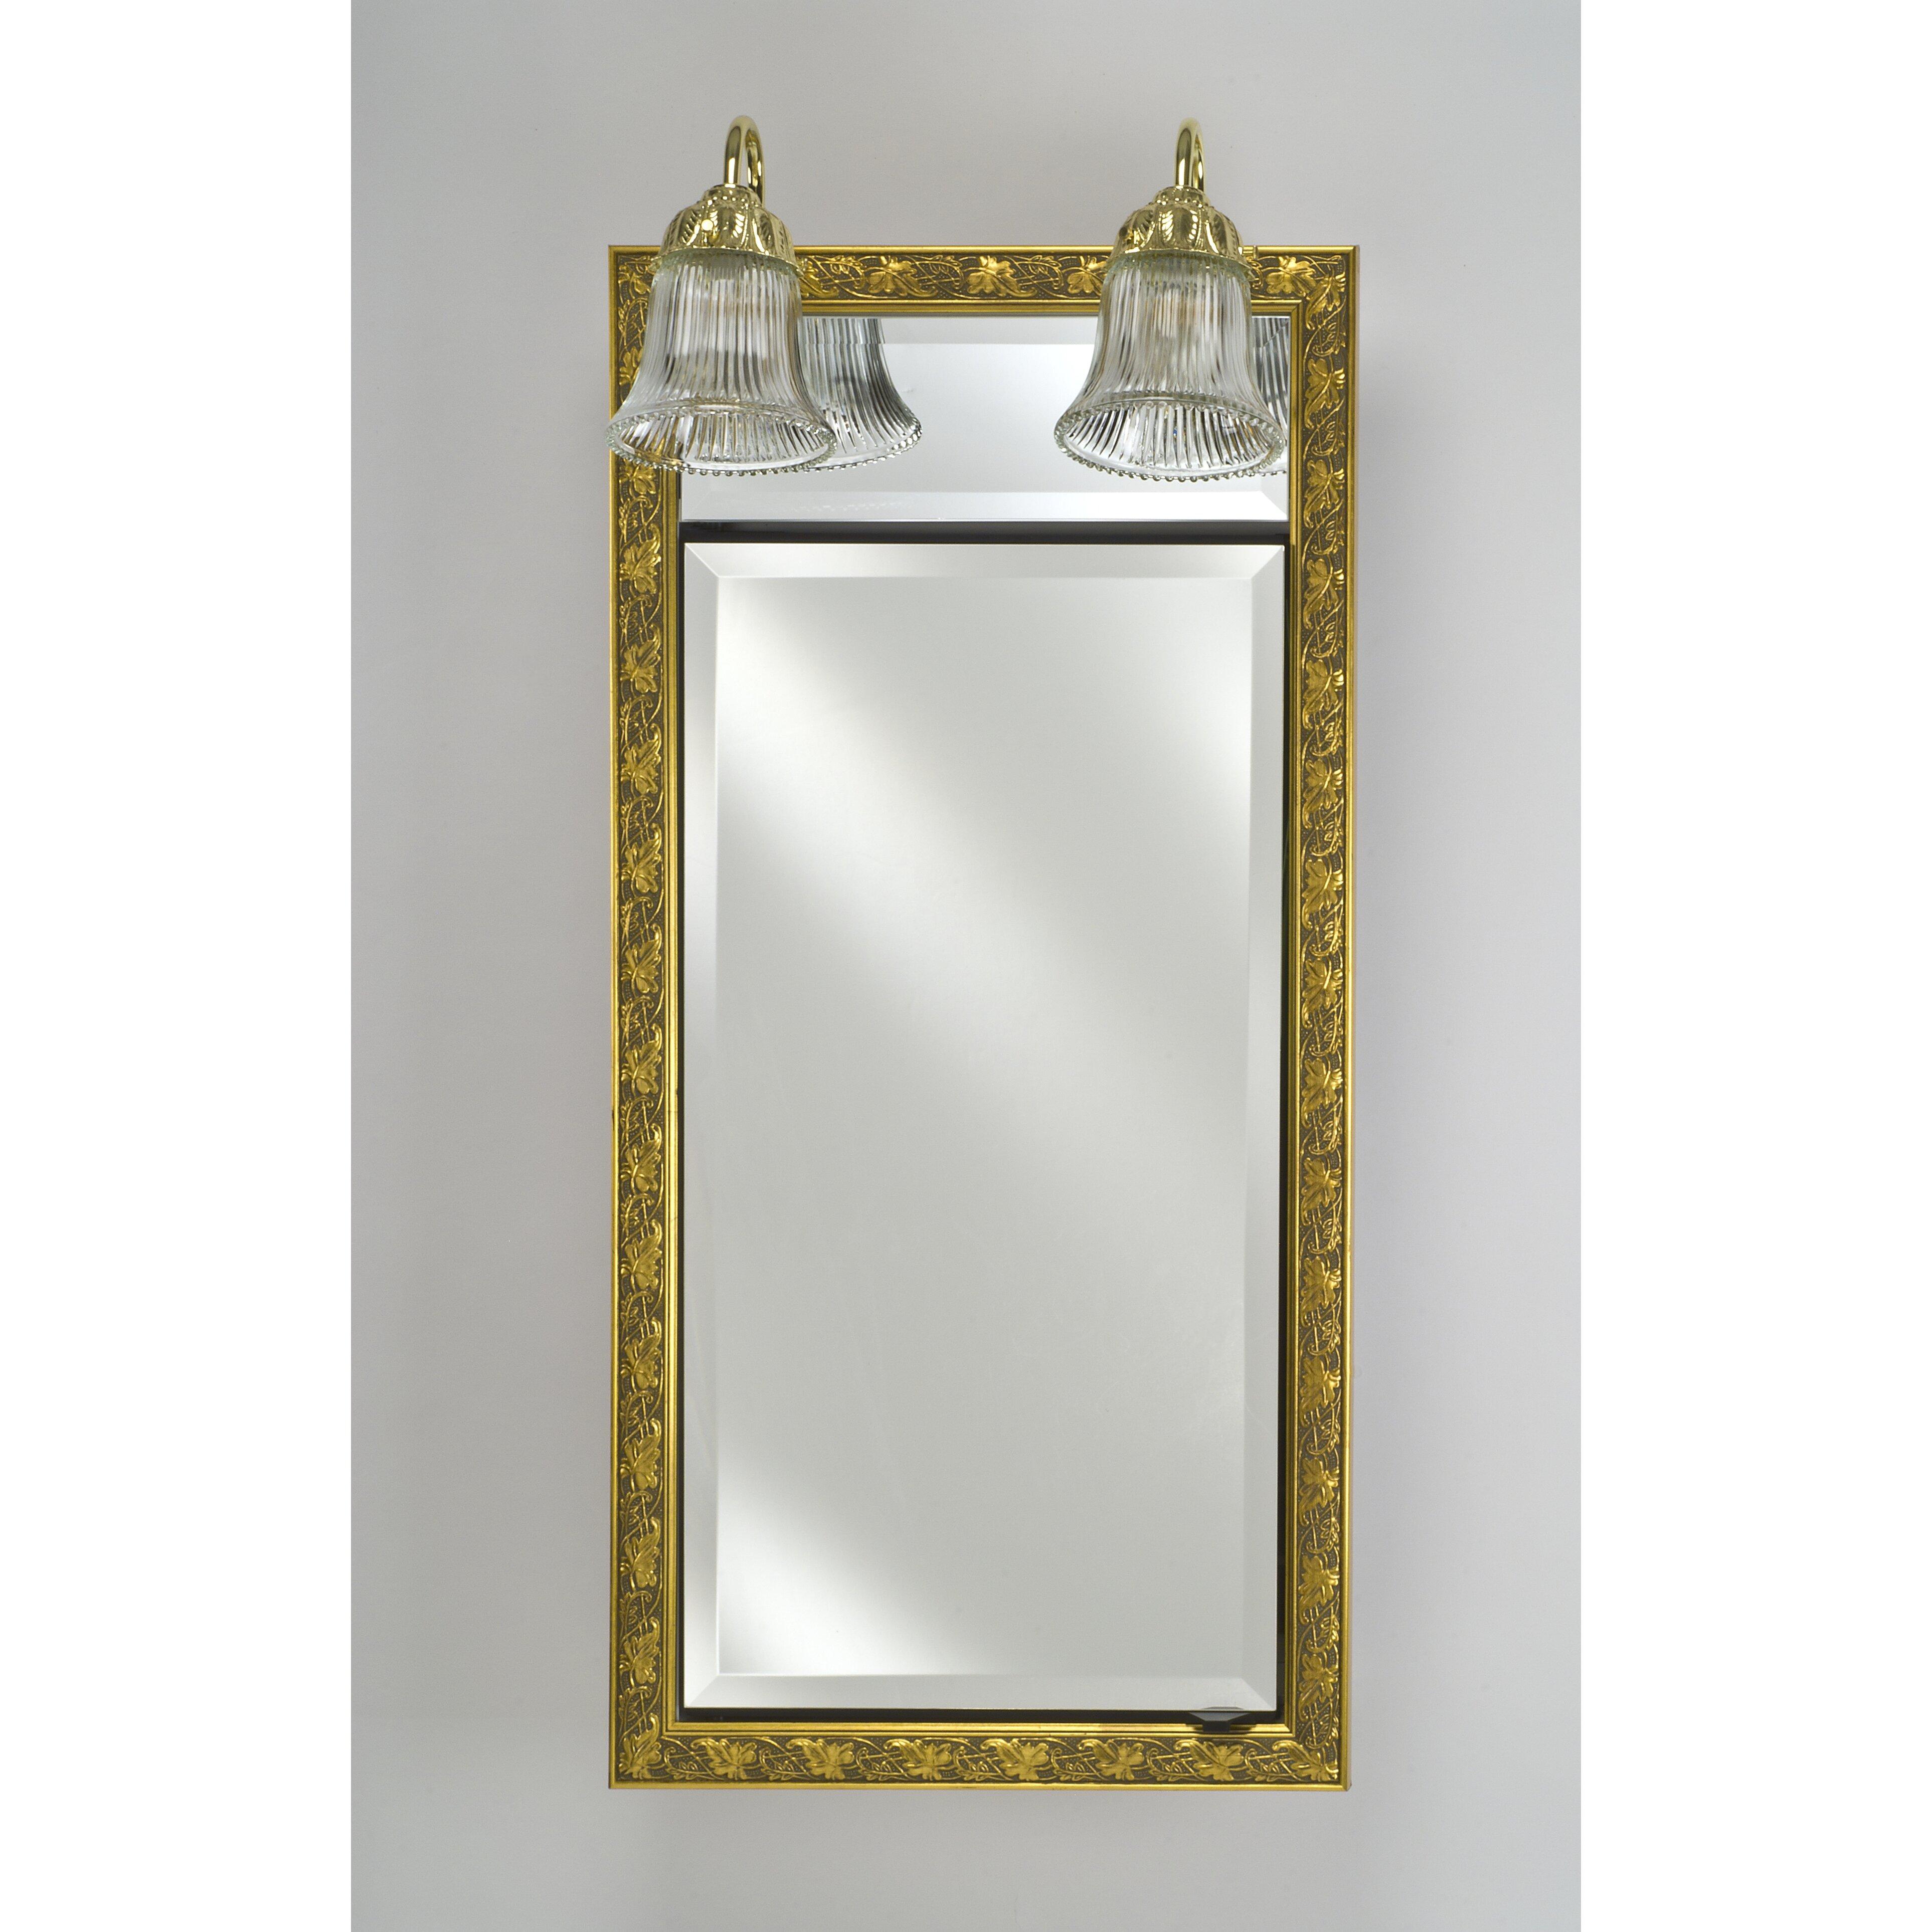 signature 24 x 40 recessed medicine cabinet wayfair. Black Bedroom Furniture Sets. Home Design Ideas